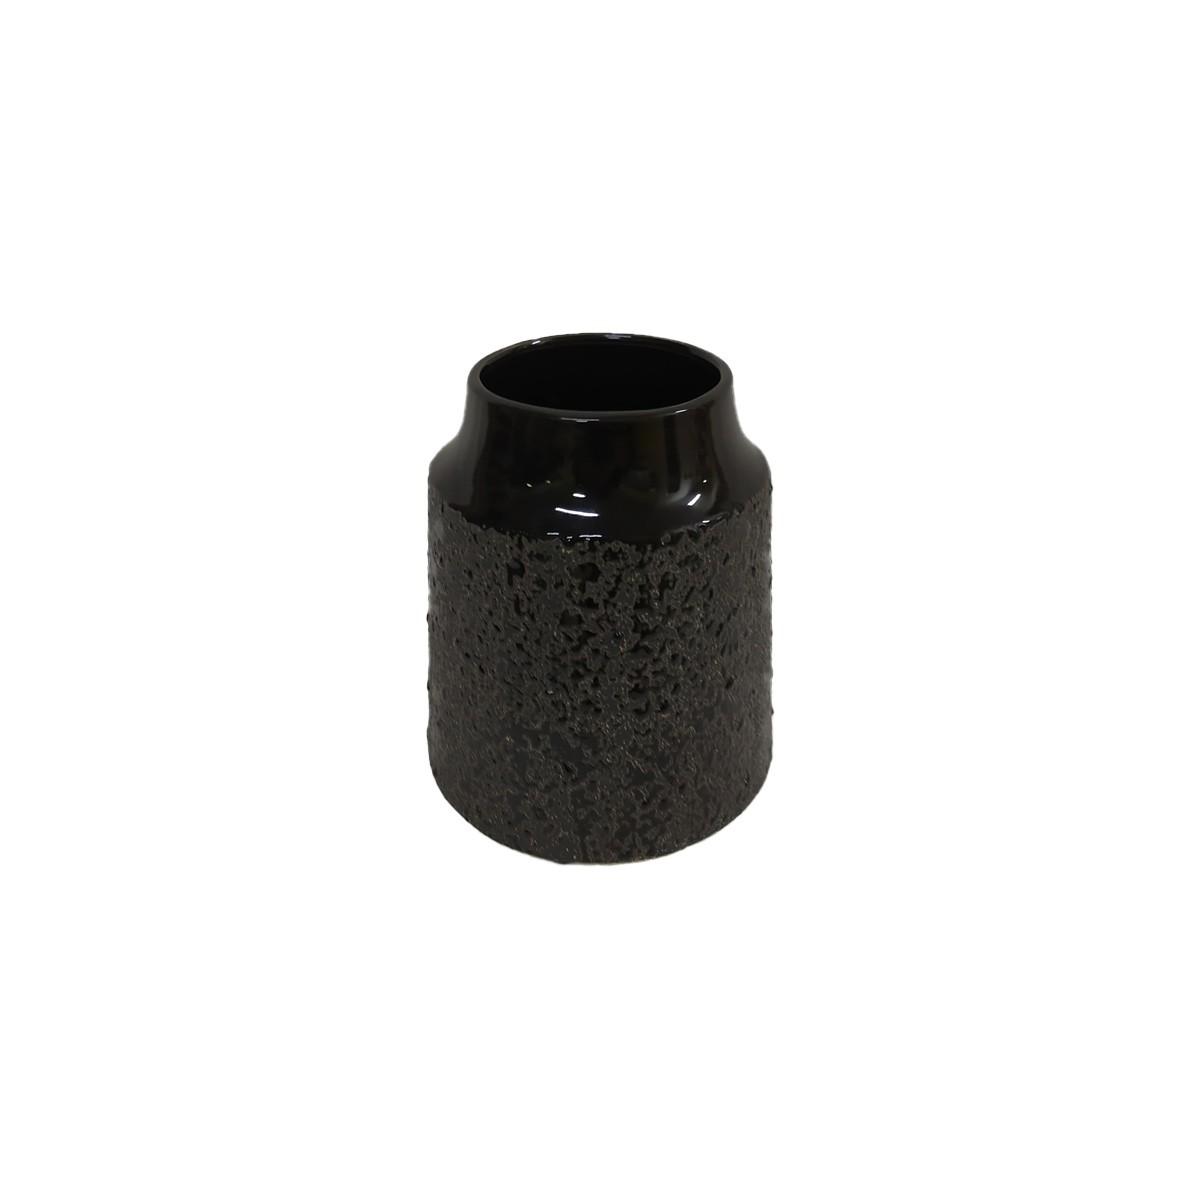 Vaso em Cerâmica Preta texturizada - 15,2 cm